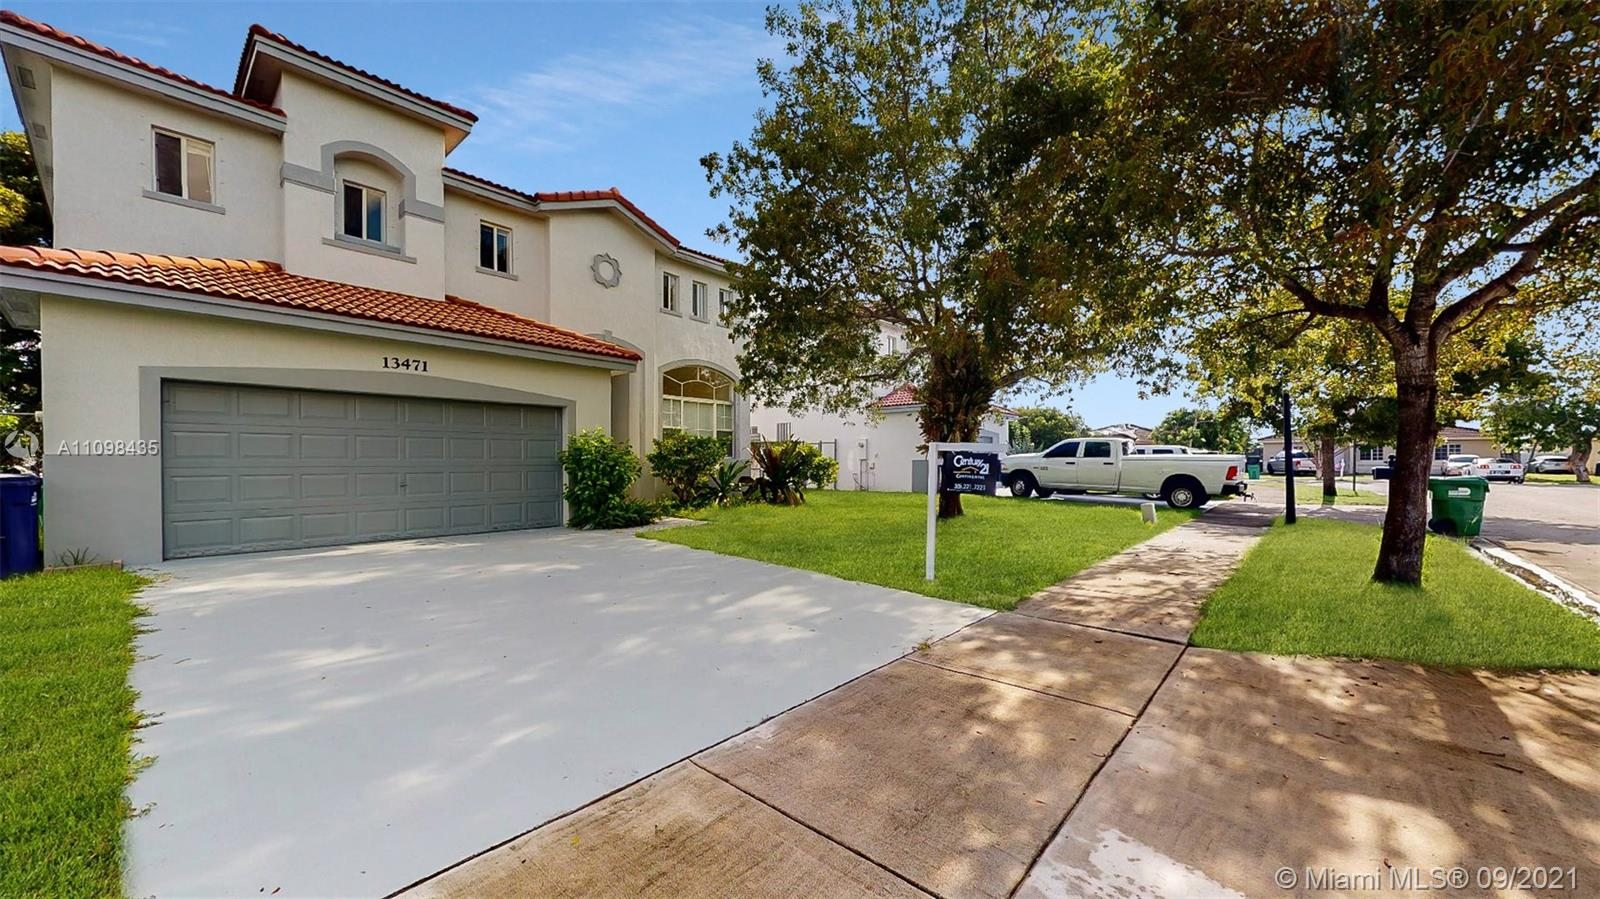 13461 Sw 260 Ln Property Photo 1